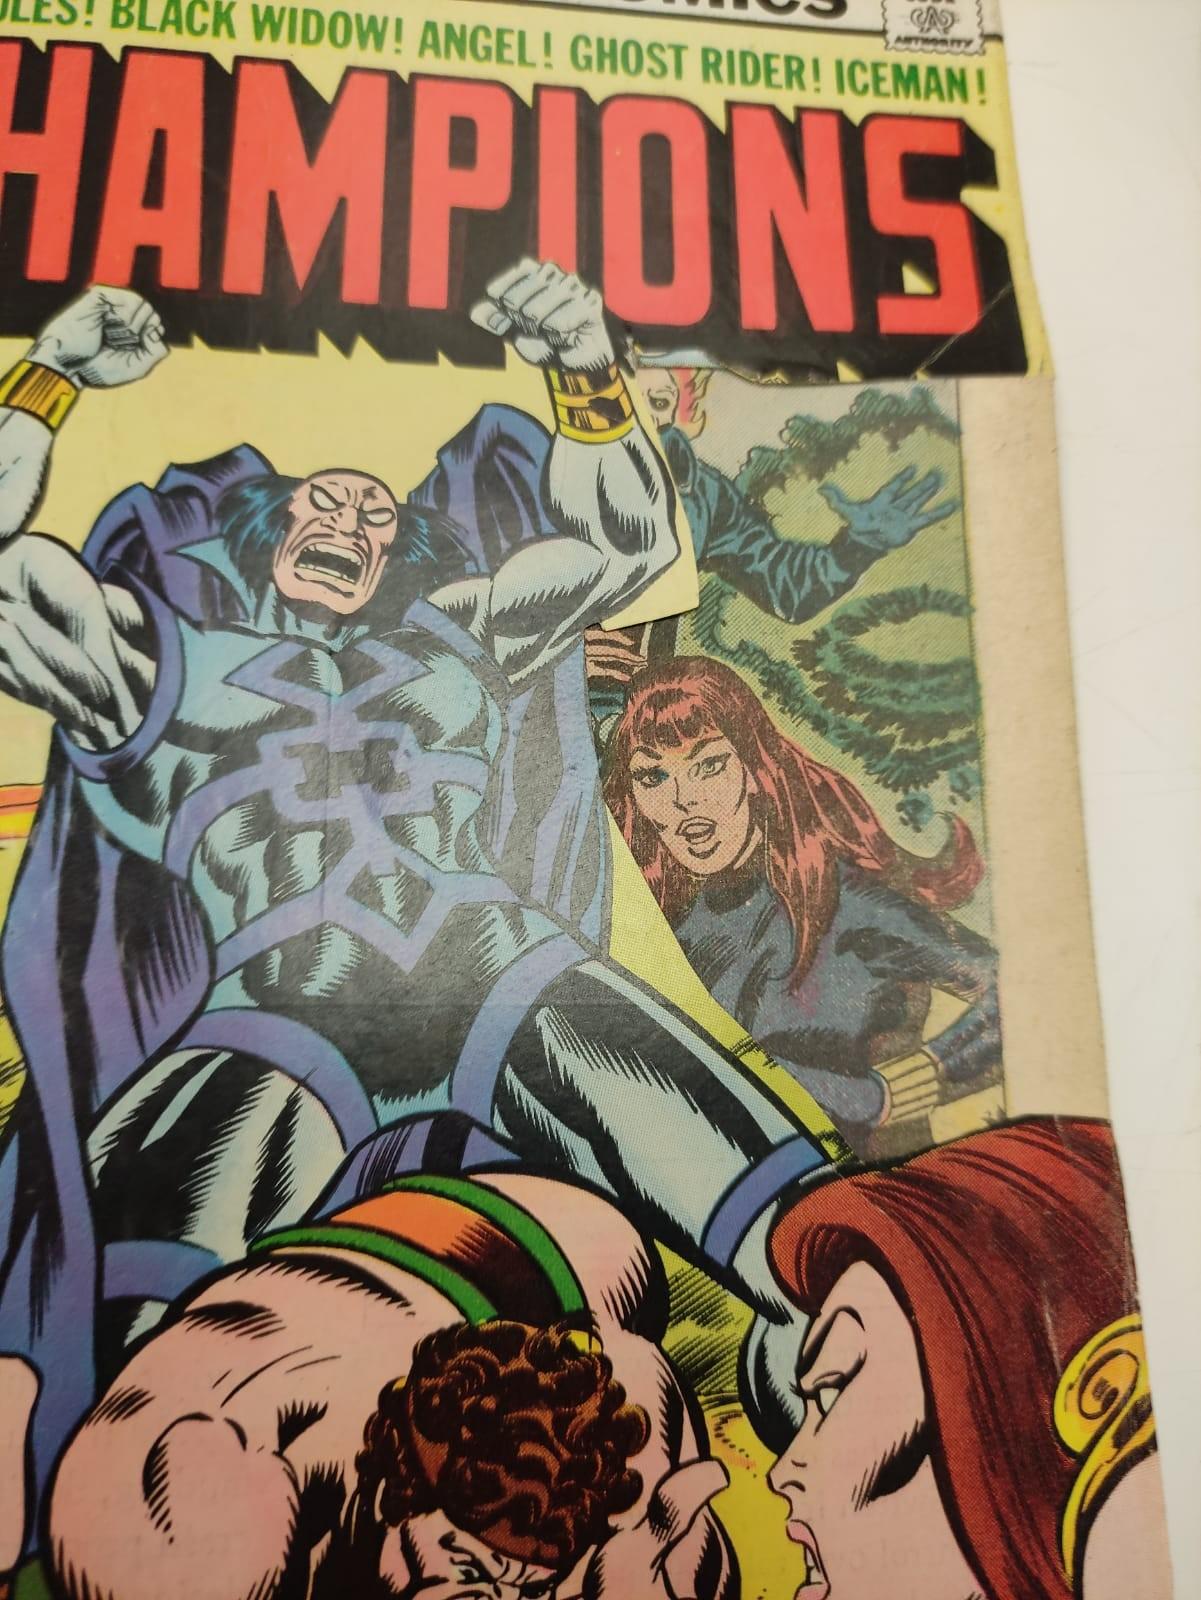 9 Copies of Vintage Marvel 'The Champion' Comics. - Image 11 of 14